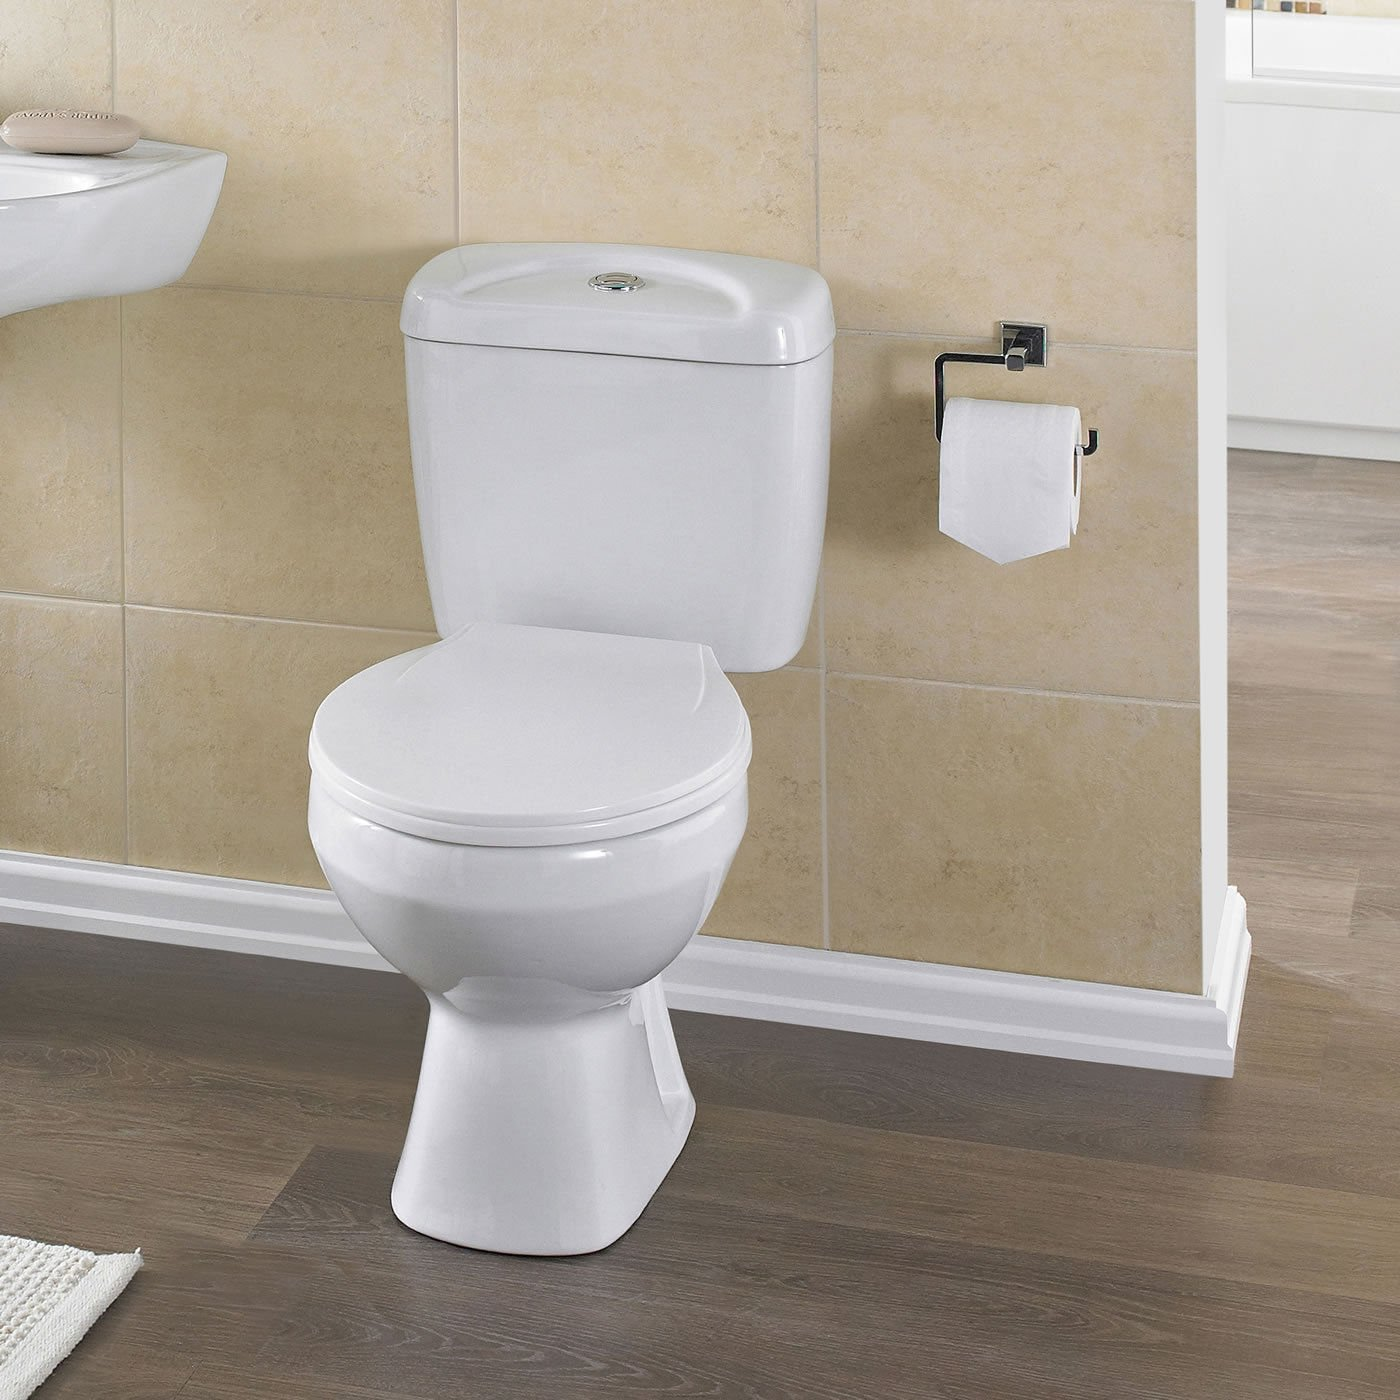 Cheap ToiletsNew Style Water Closet One Piece Strap